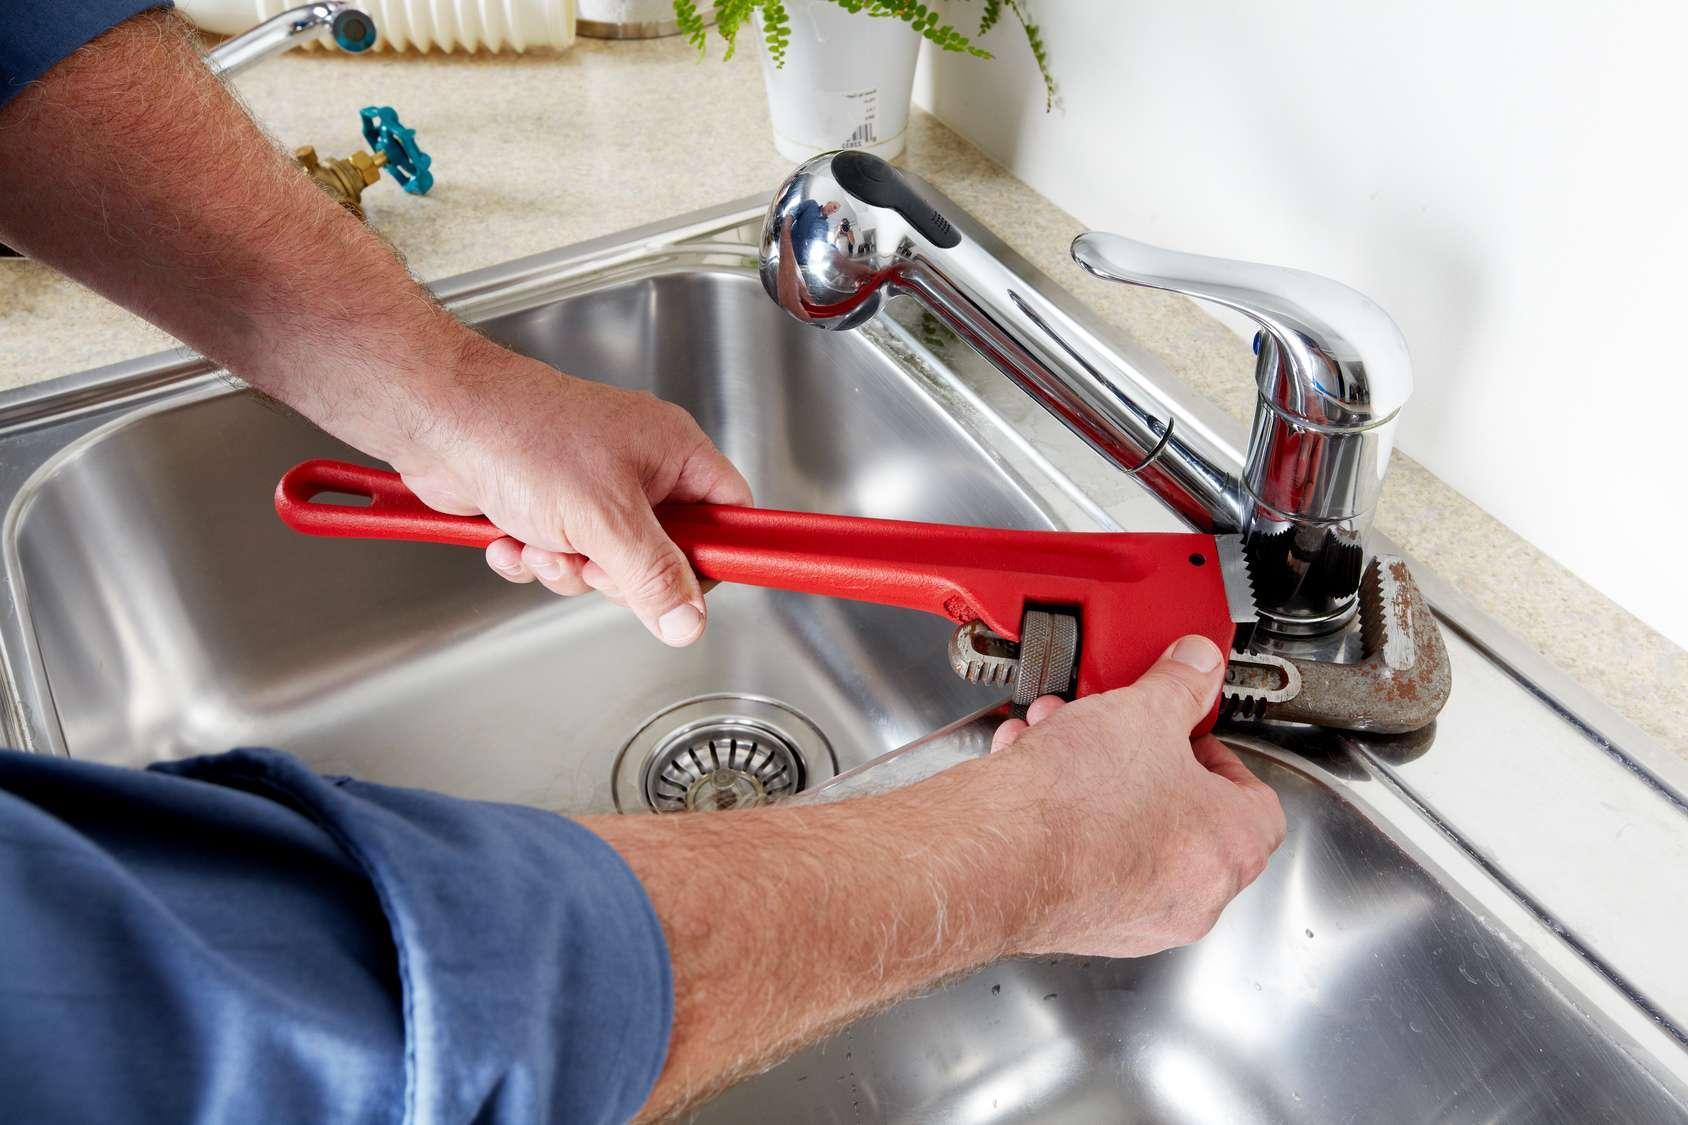 windermere plumbing emergency plumber orlando a1 service plumbing